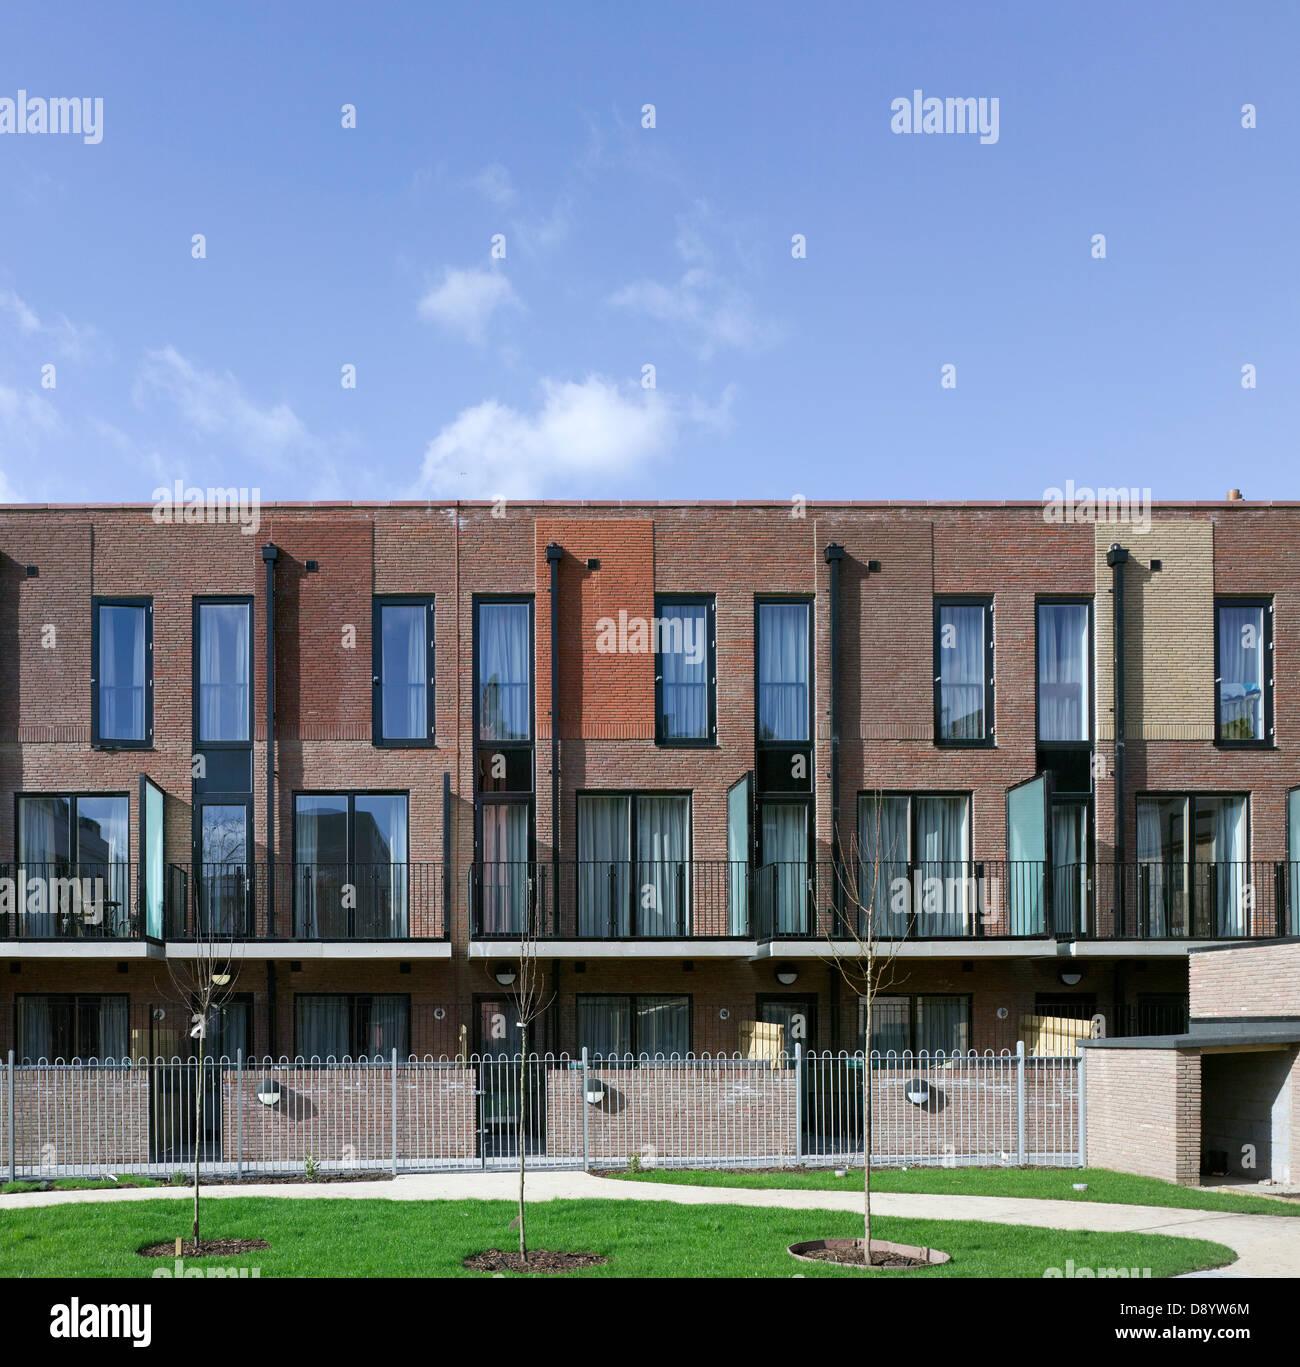 Street Housing: Library Street Affordable Housing, London, United Kingdom